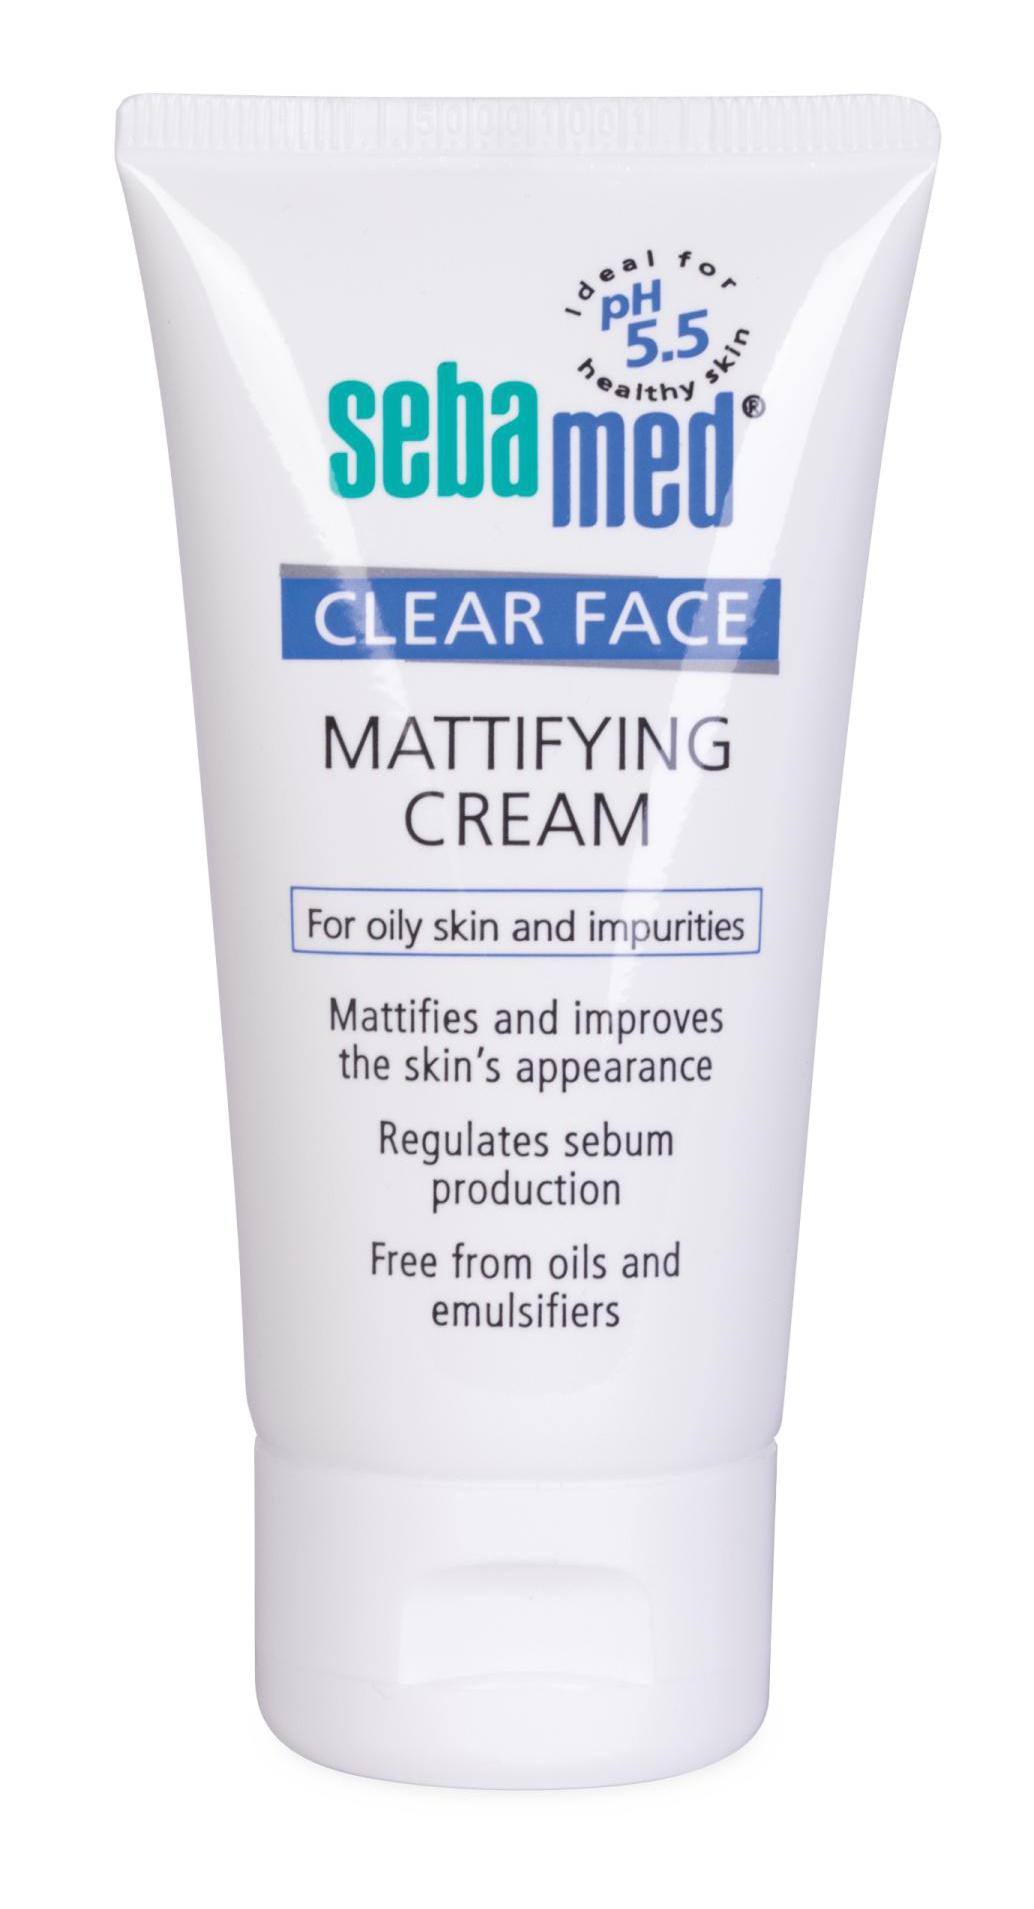 Sebamed Clear Face Mattifying Cream Ph 5.5